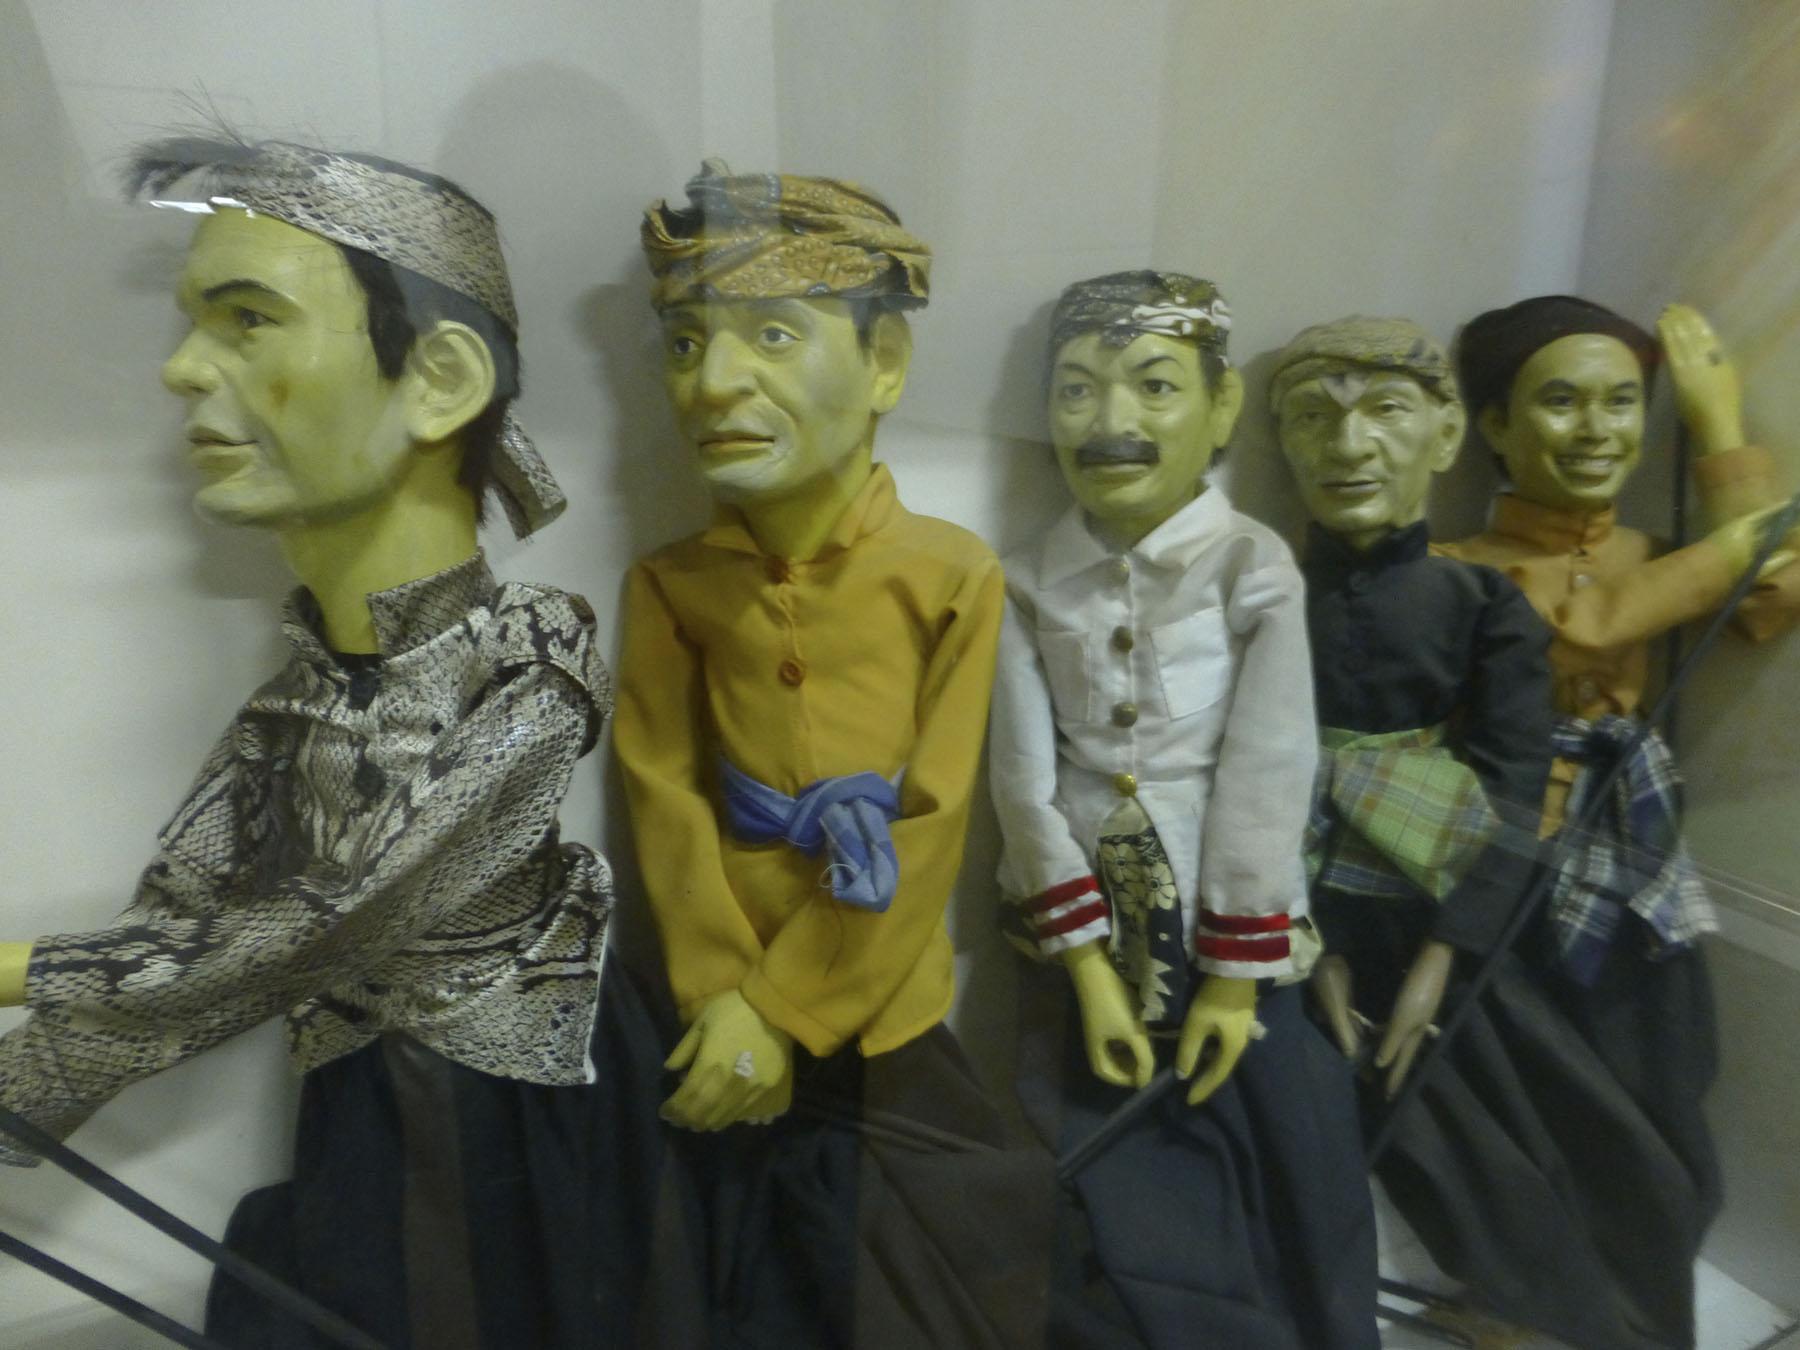 Life-Like Puppets